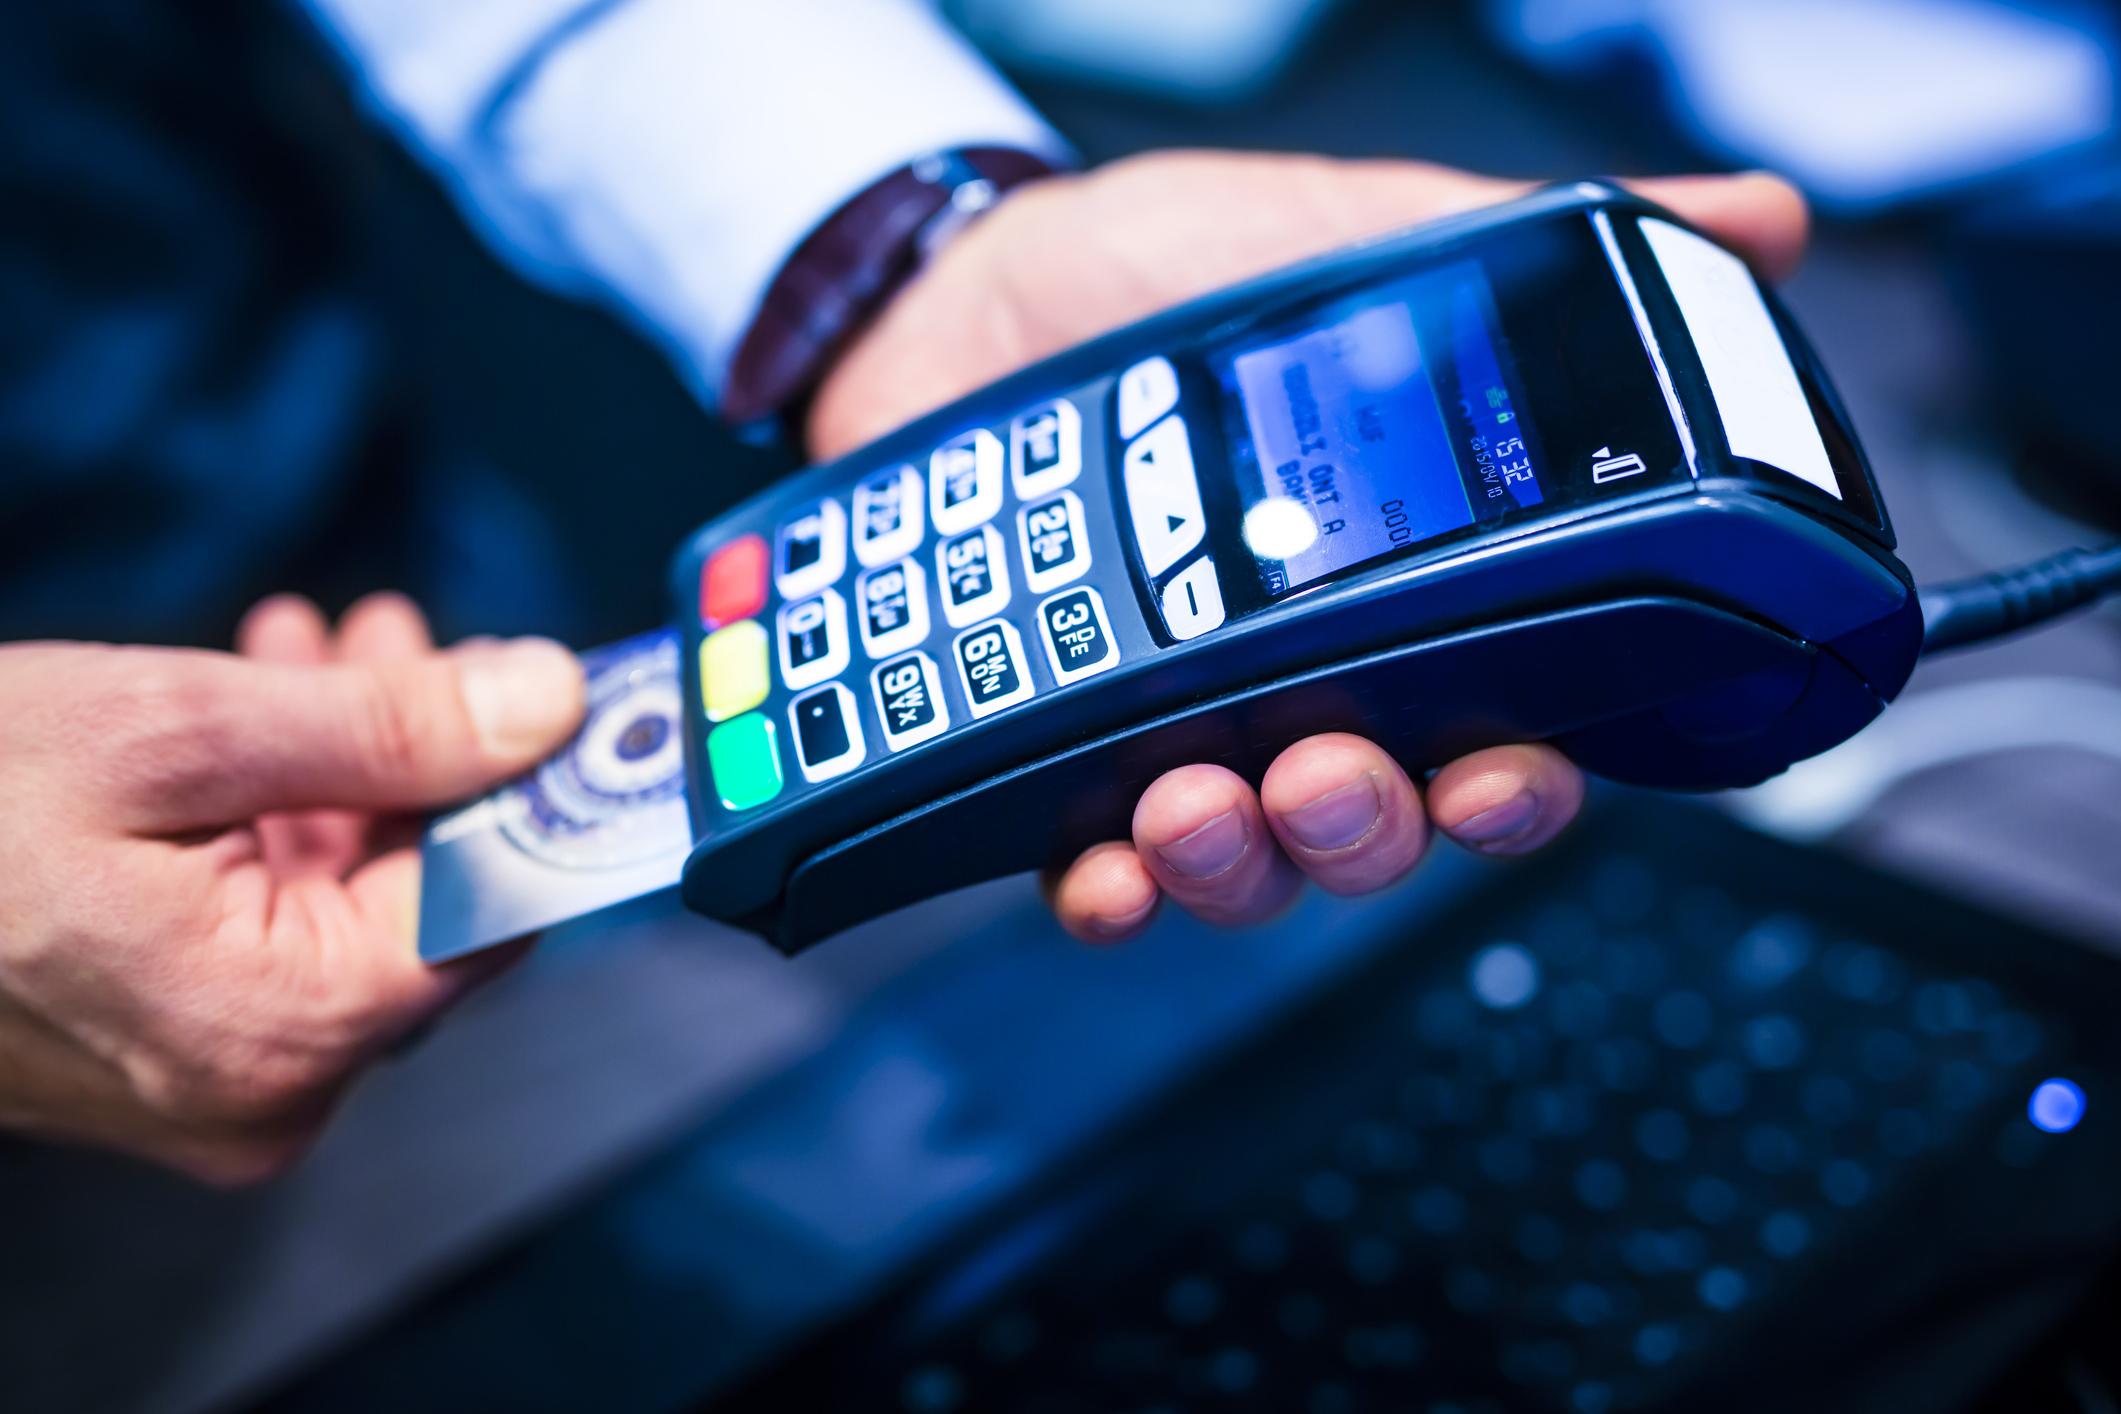 Man inserting a credit card into a handheld credit terminal.